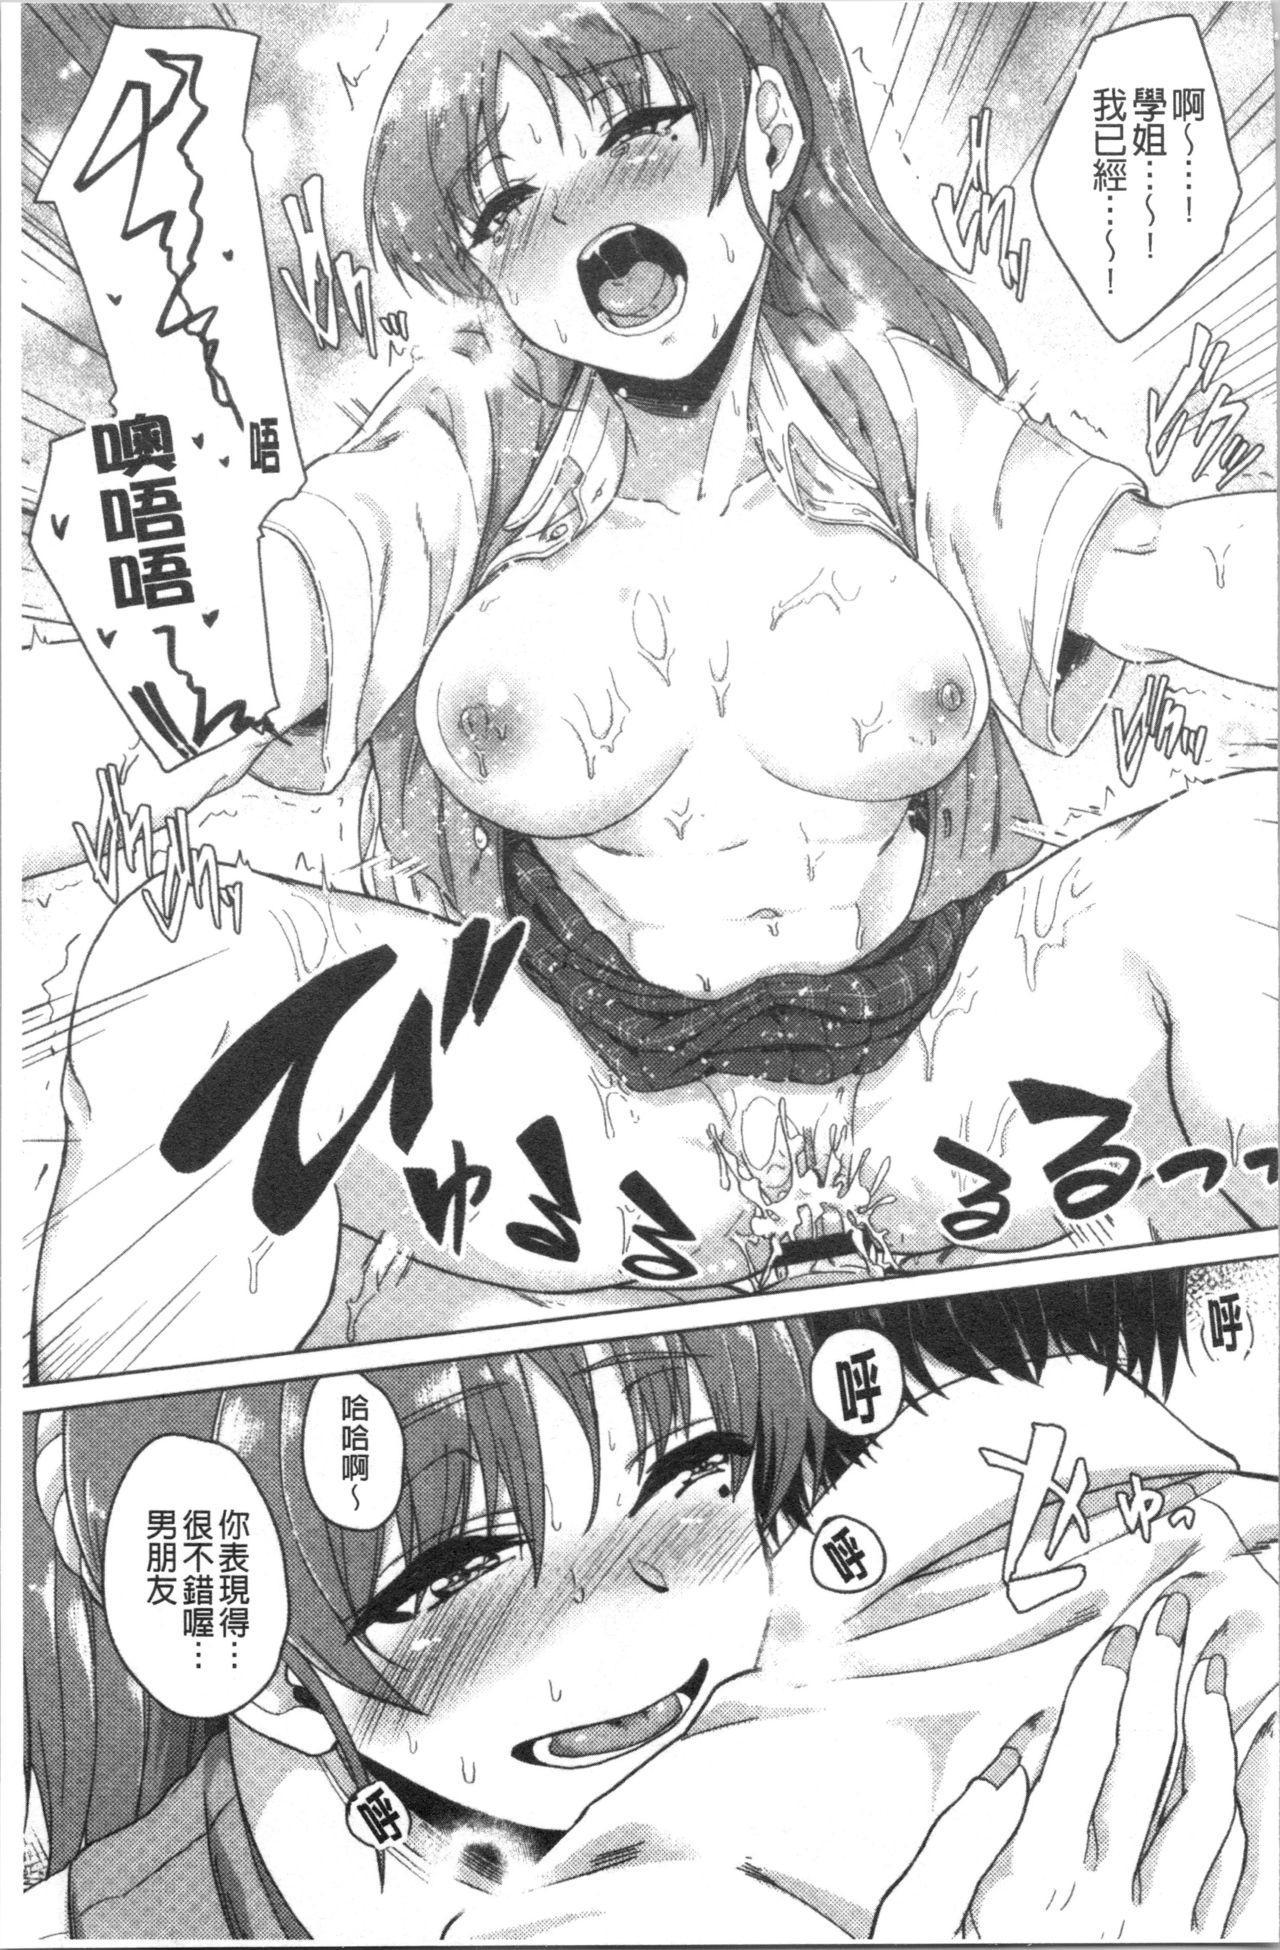 Kanojo ga SEX ni nare teru wake | 女友對激情性愛變很習慣的理由 19